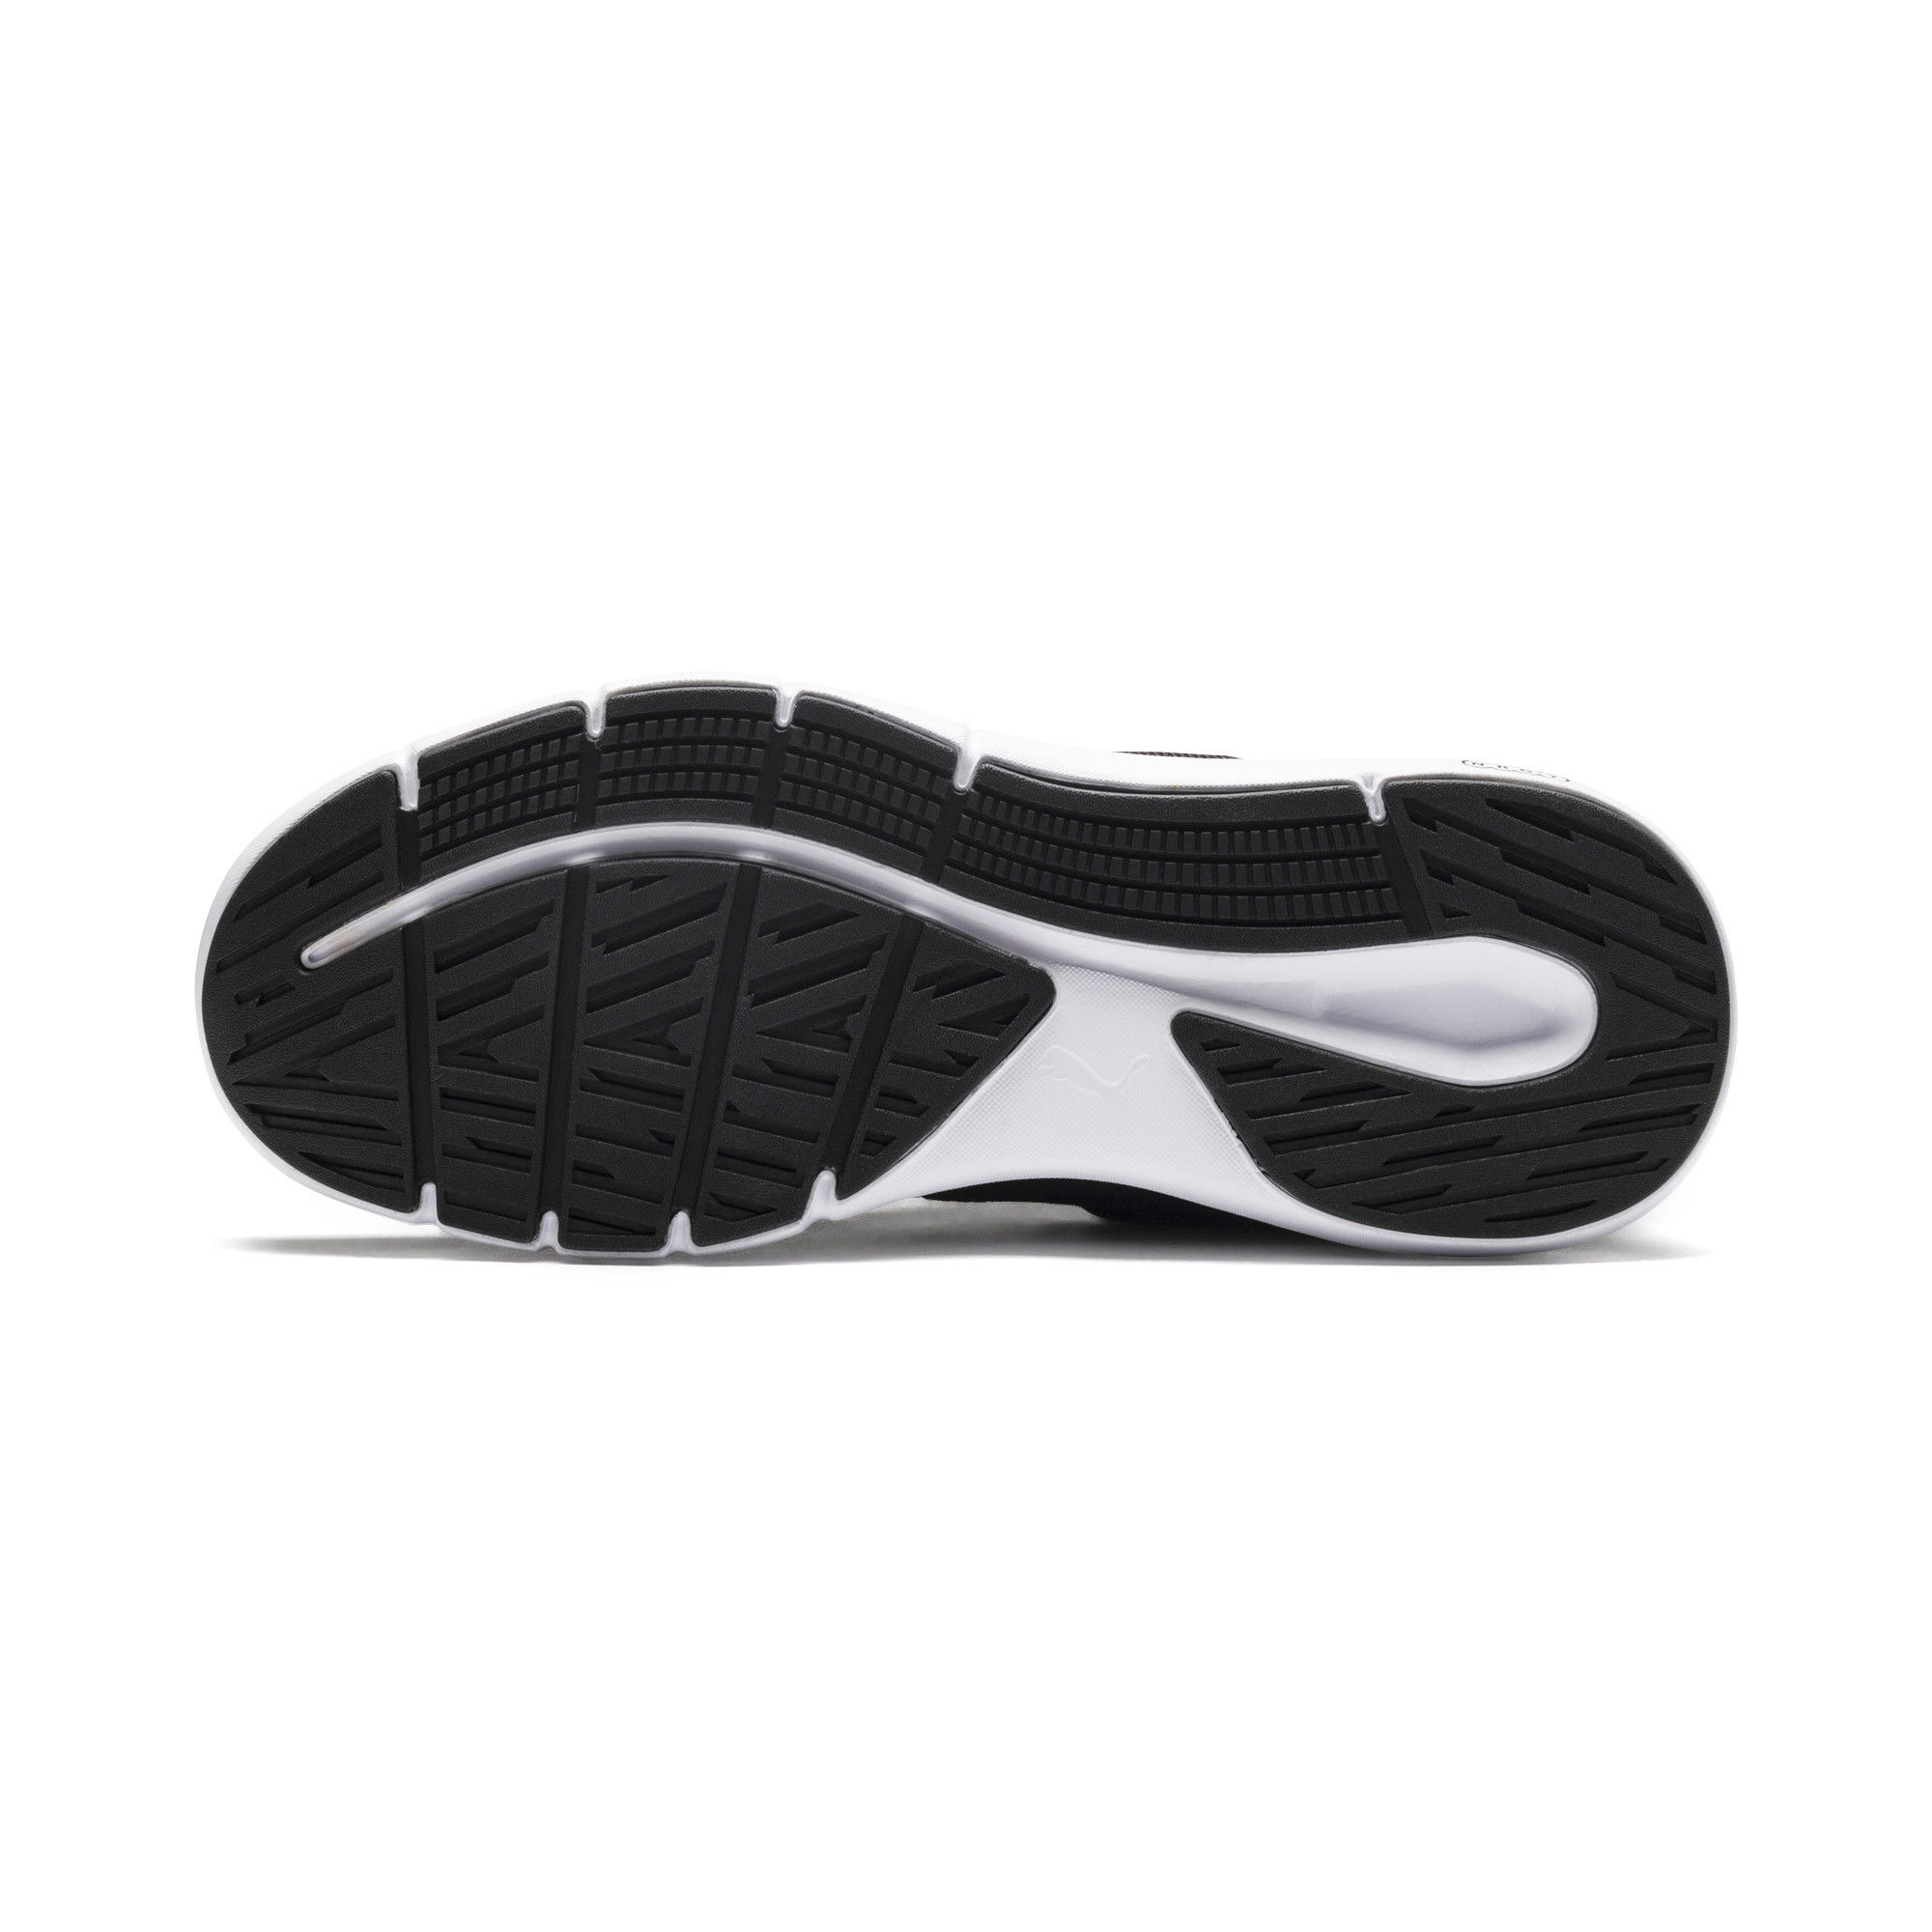 Zapatillas de running para mujer NRGY Dynamo Futuro